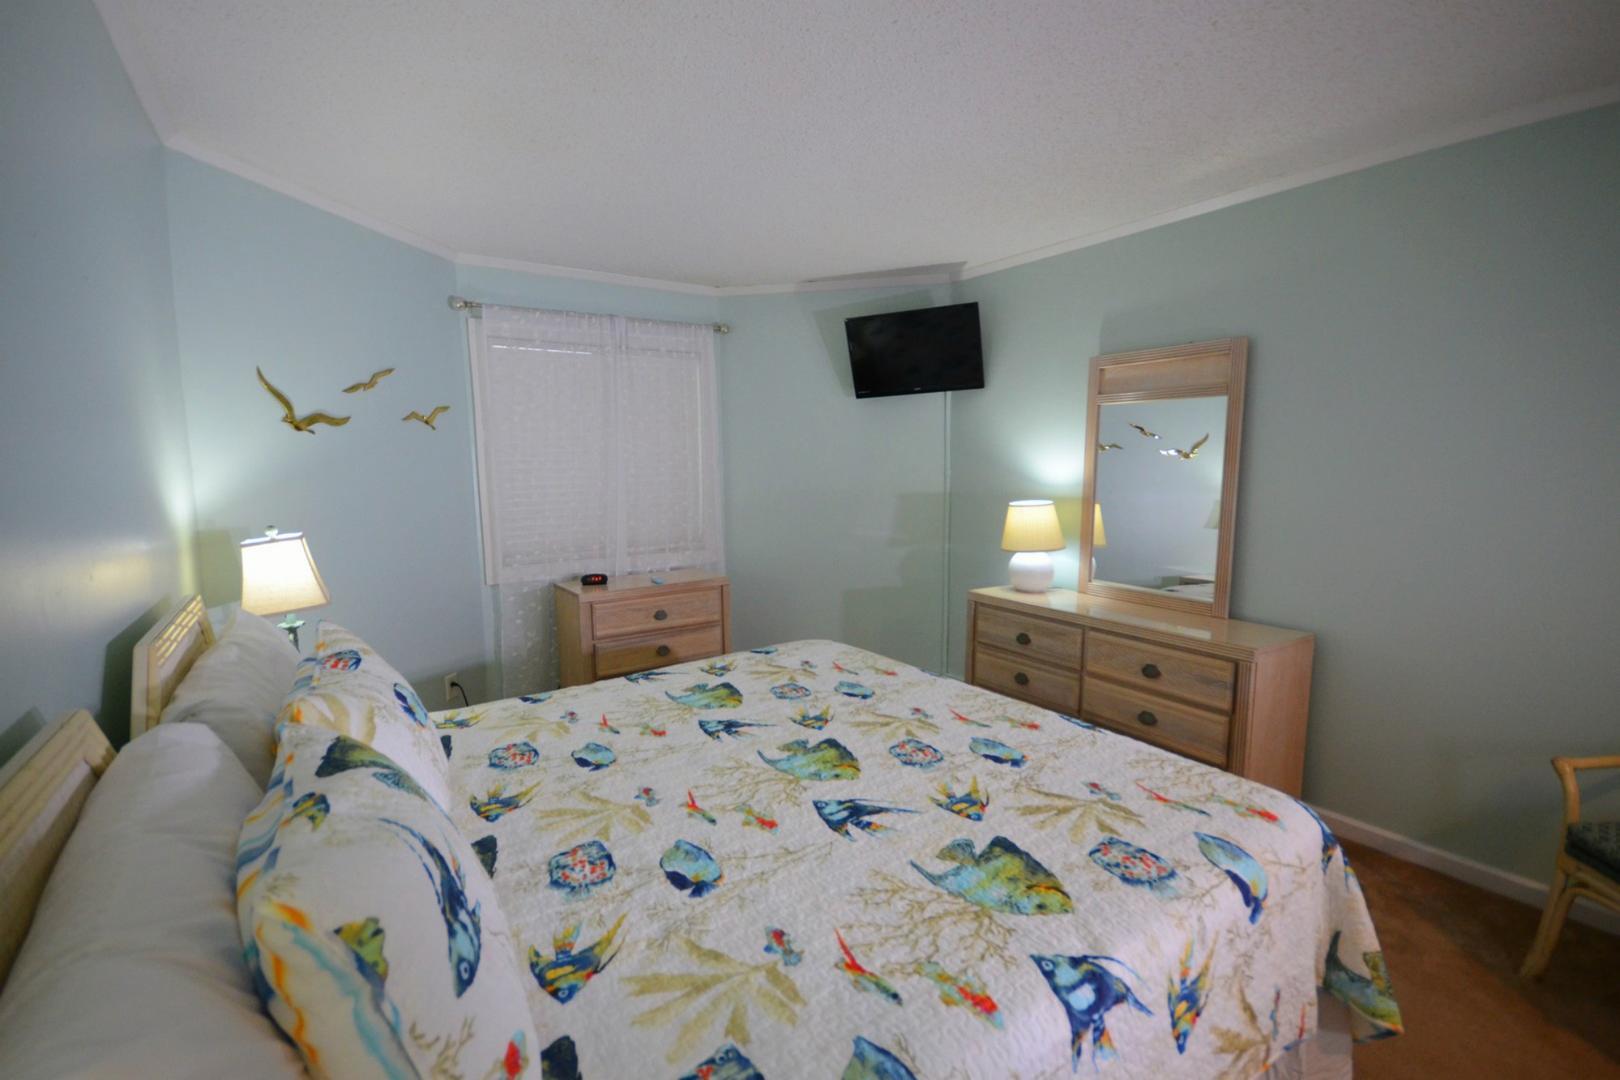 Ocean Creek L2256 - Bedroom 1